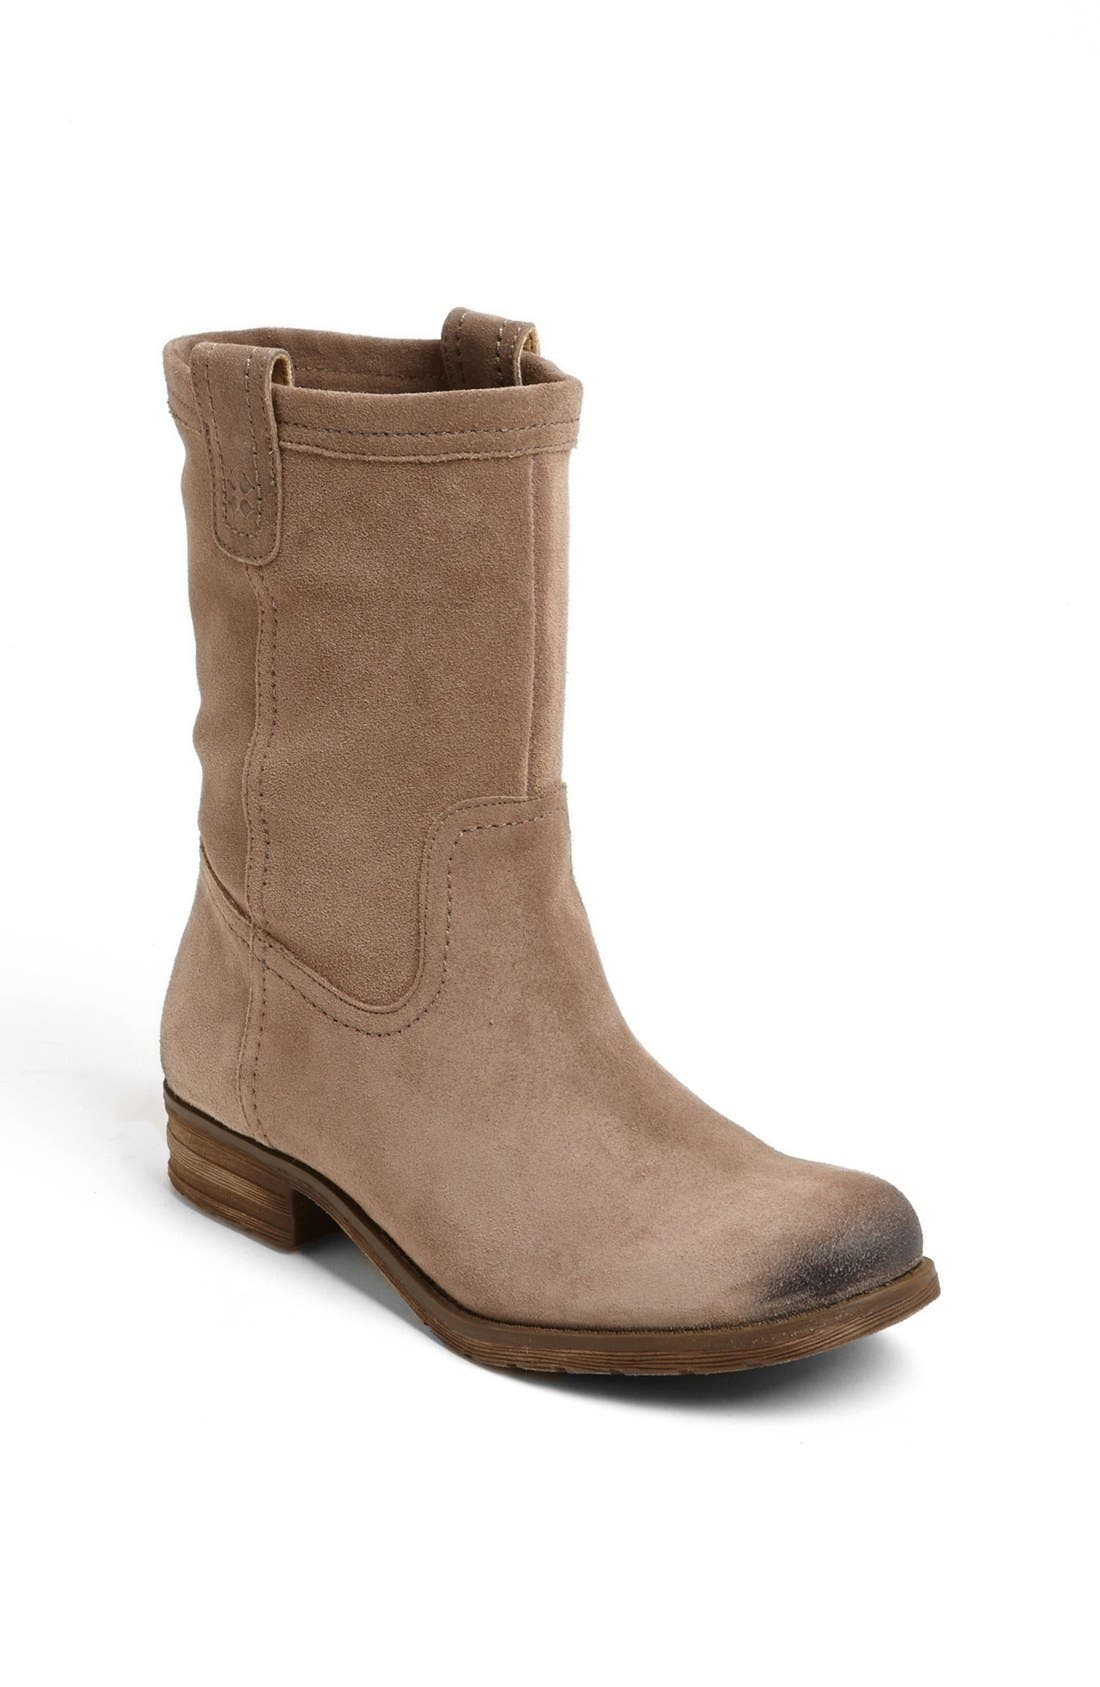 Main Image - Naturalizer 'Basha' Boot